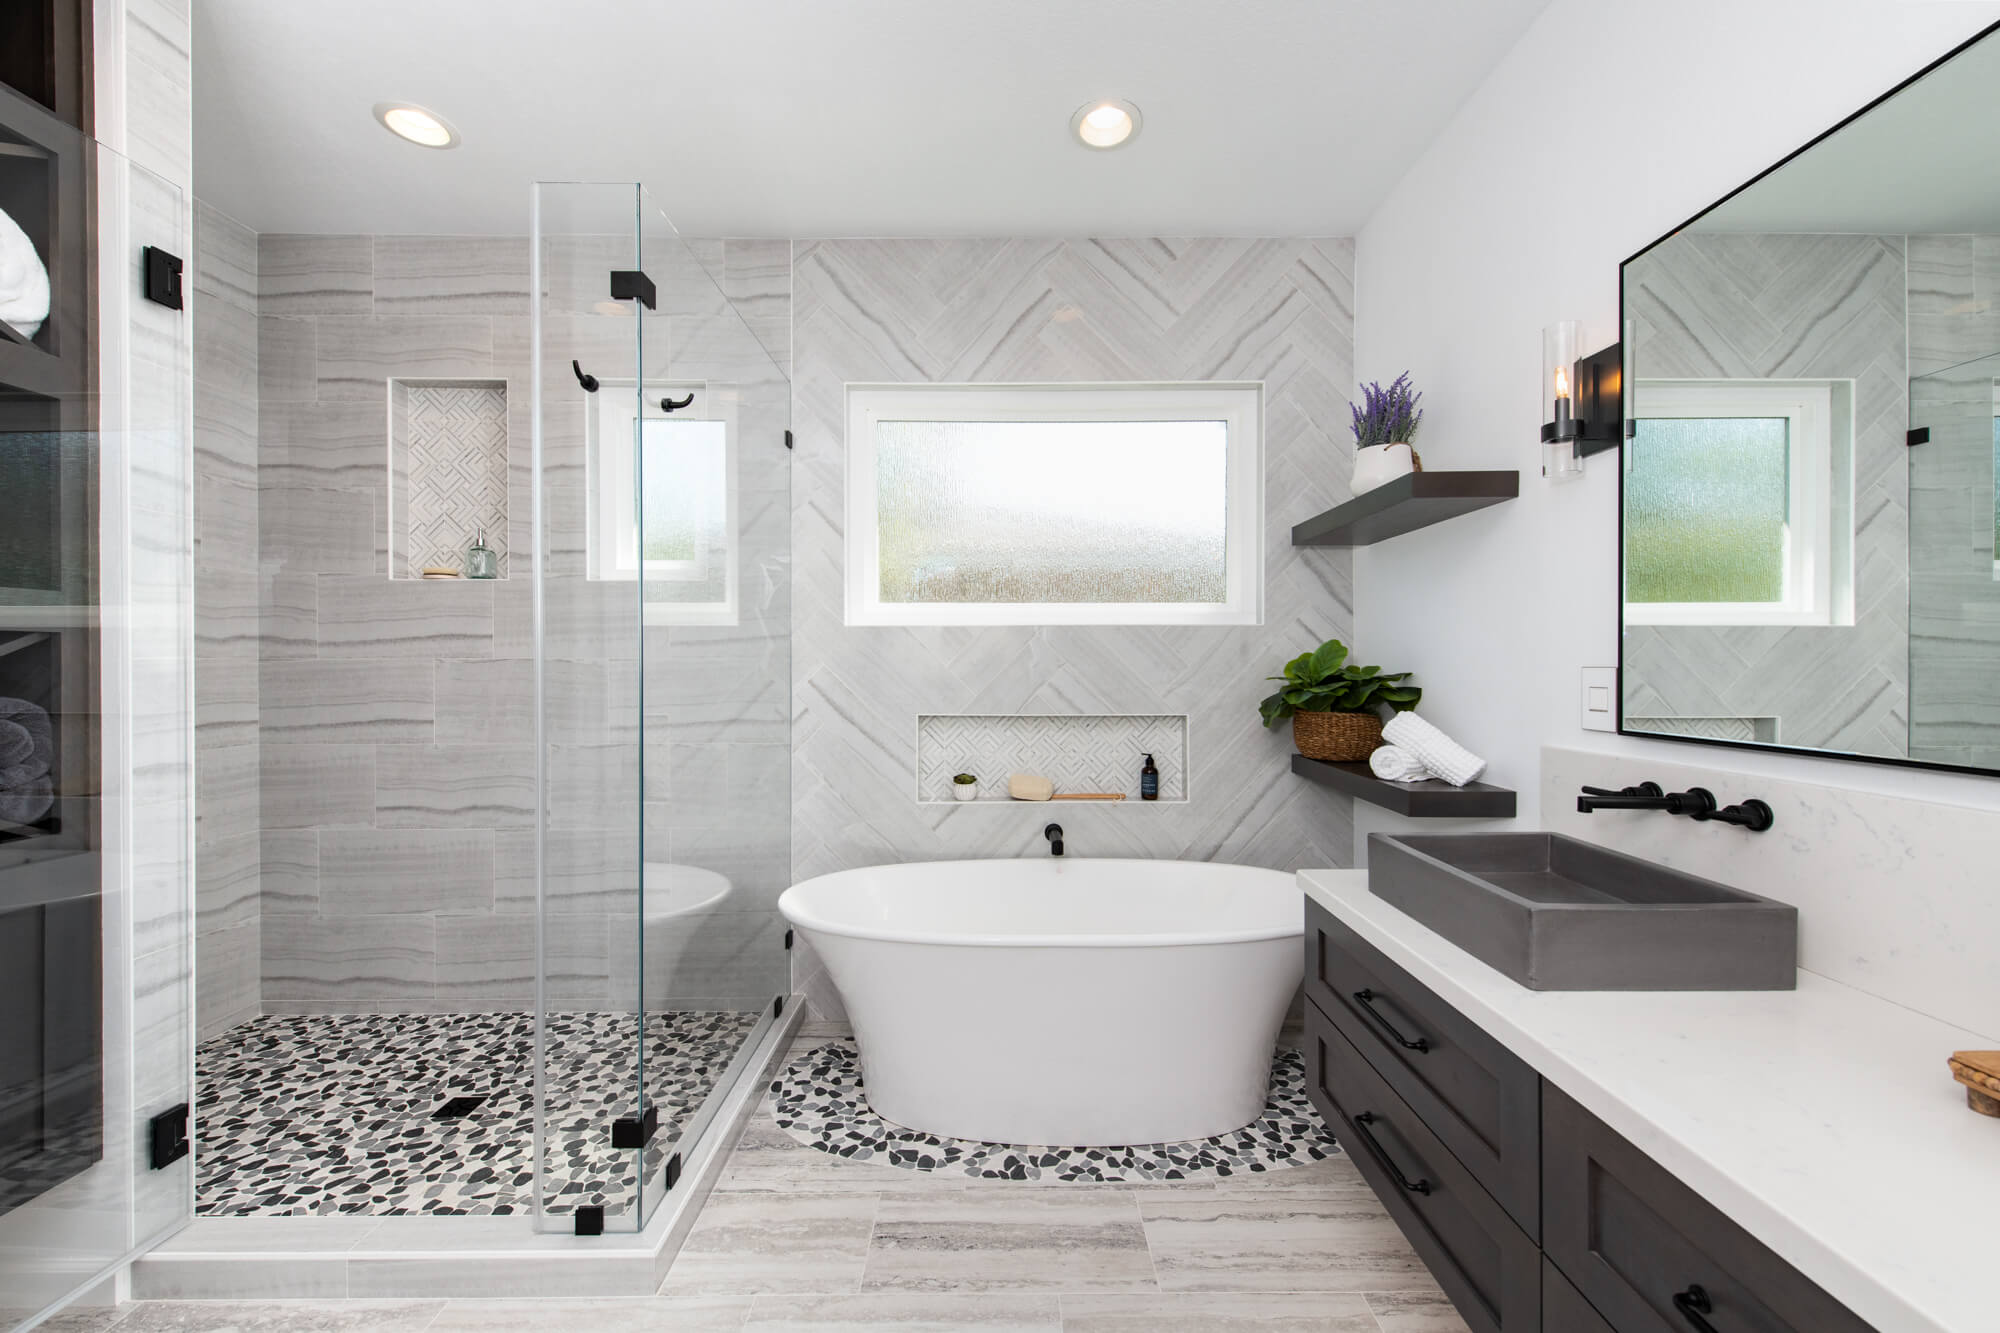 Master bathroom remodel with modern design elements